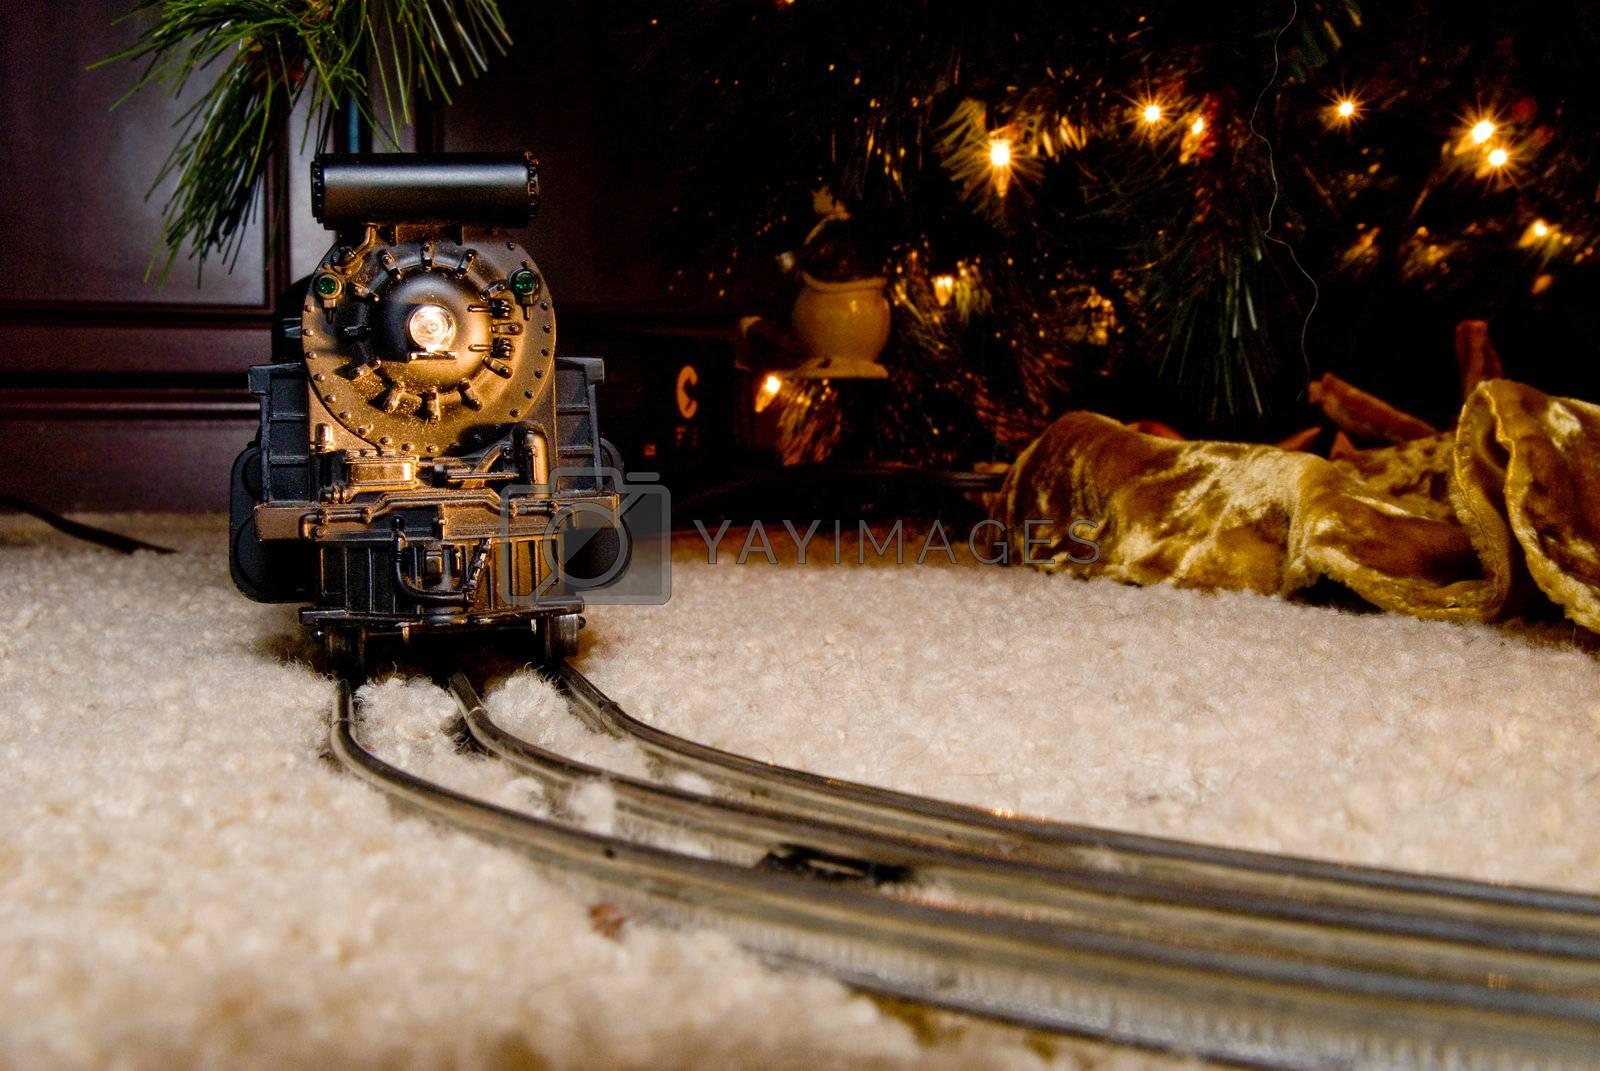 A model train making its way around a Christmas tree.